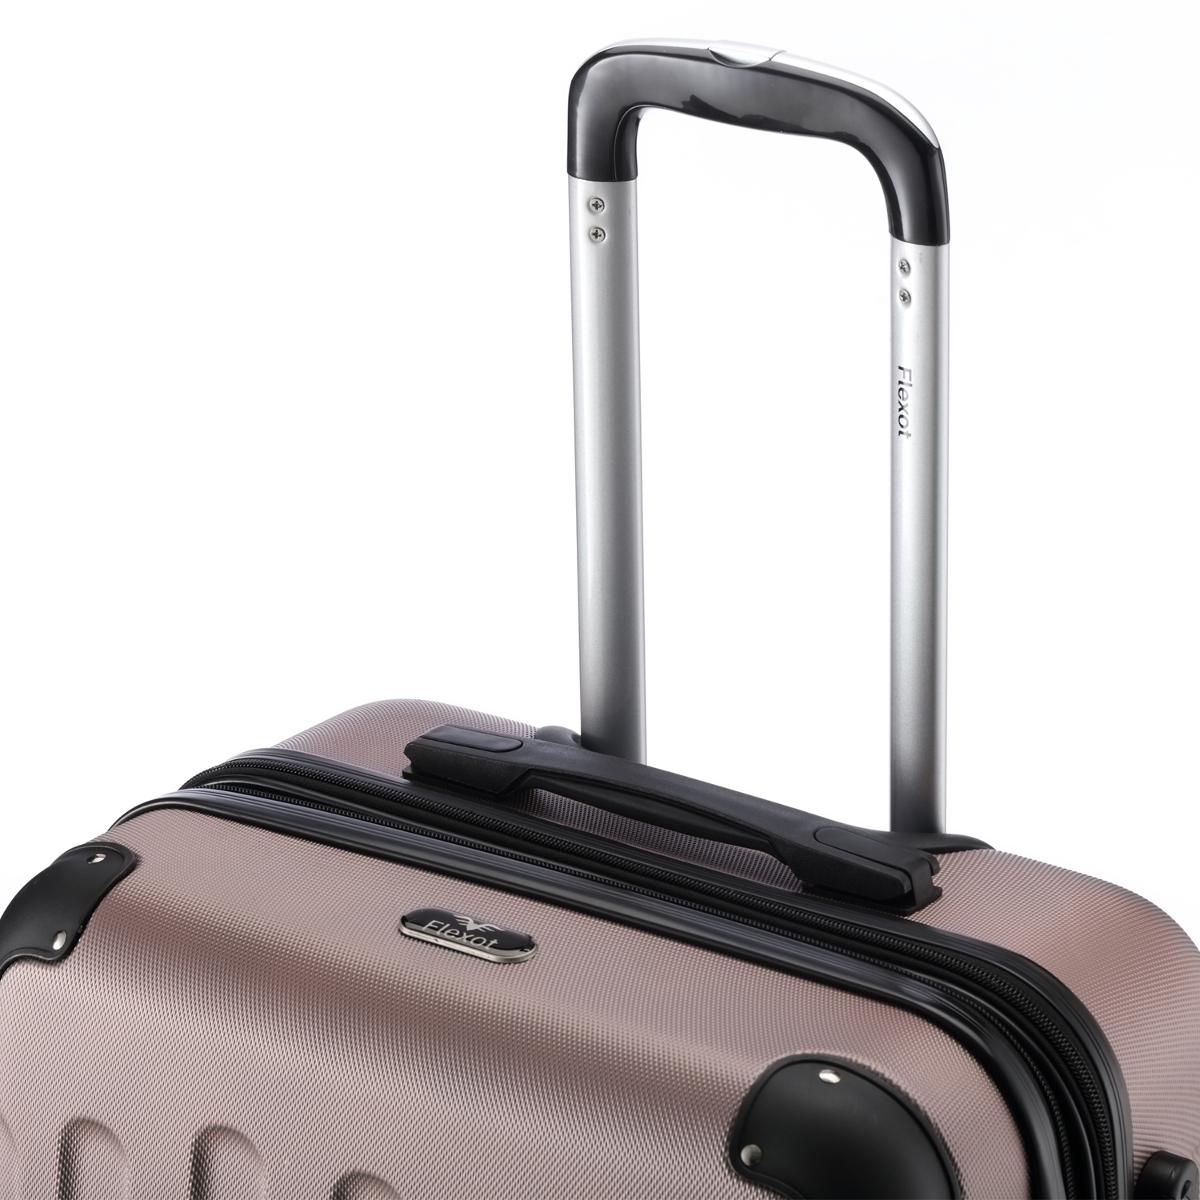 Koffer-Flexot-2045-Hartschalenkoffer-Trolley-Kofferset-Reisekoffer-M-L-XL-Set Indexbild 102